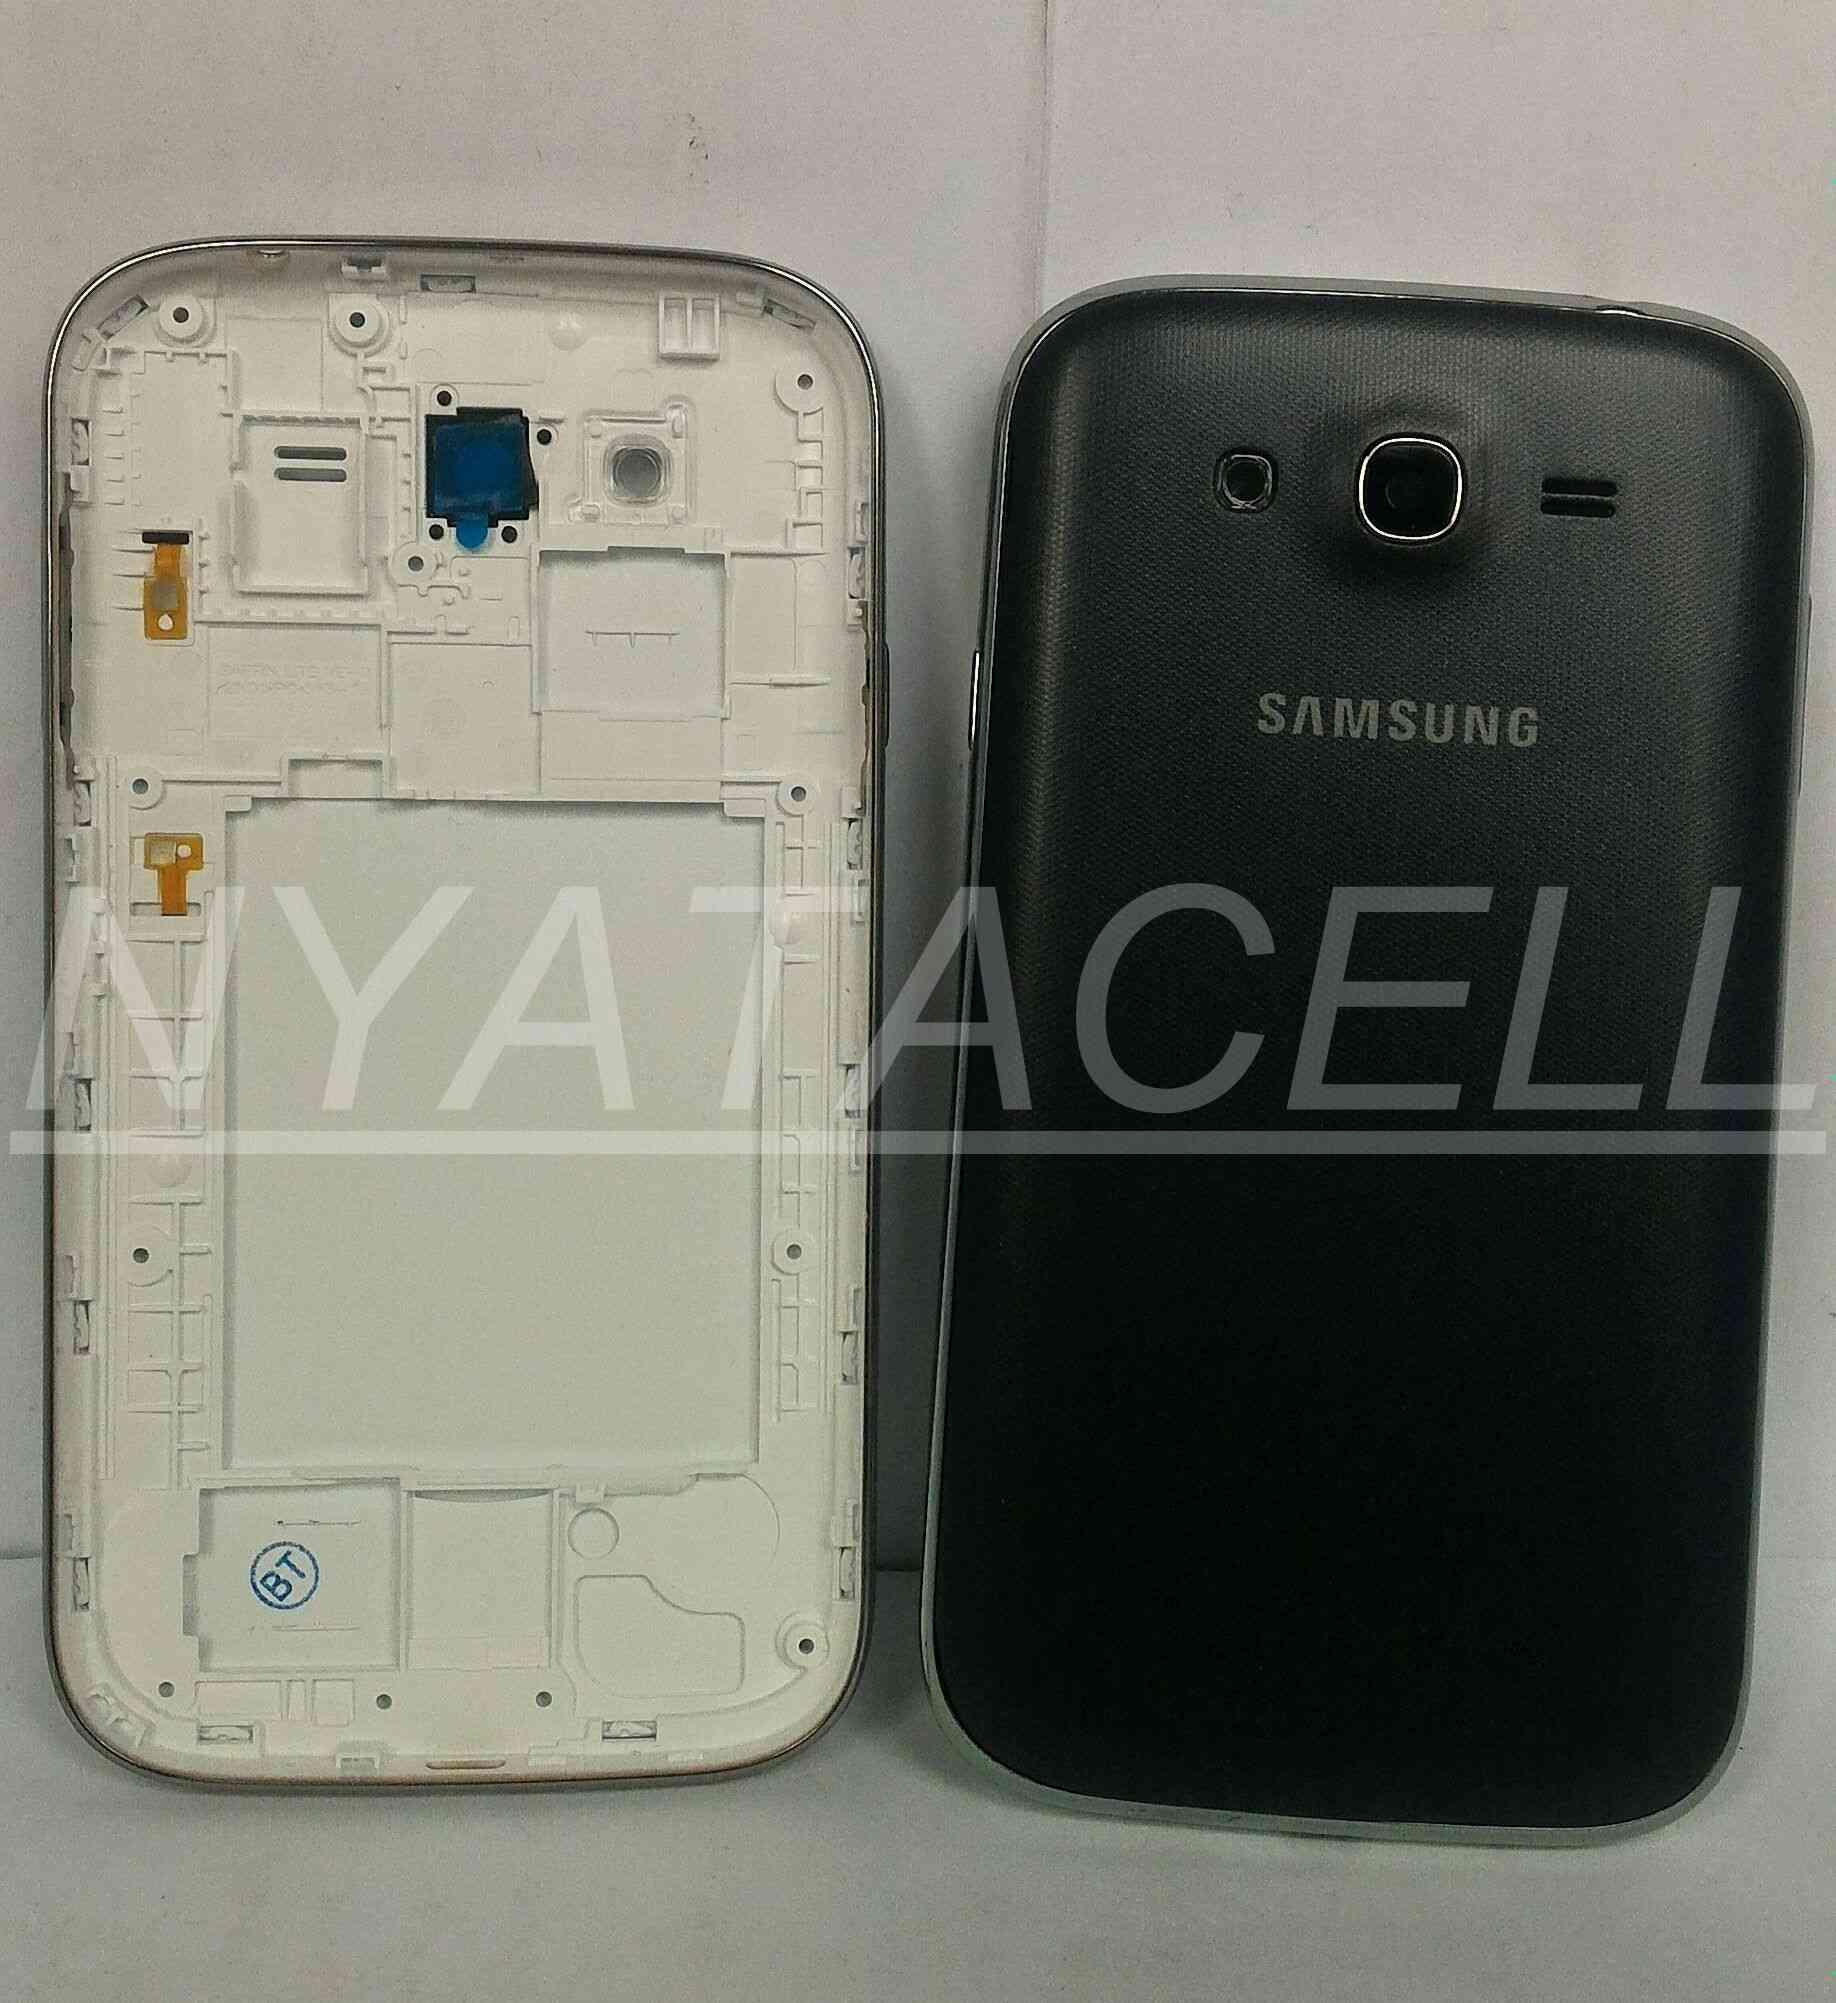 Jual Casing Fullset Samsung Galaxy Grand Neo I9060 Original Housing Plus Bezel Nyatacell Tokopedia